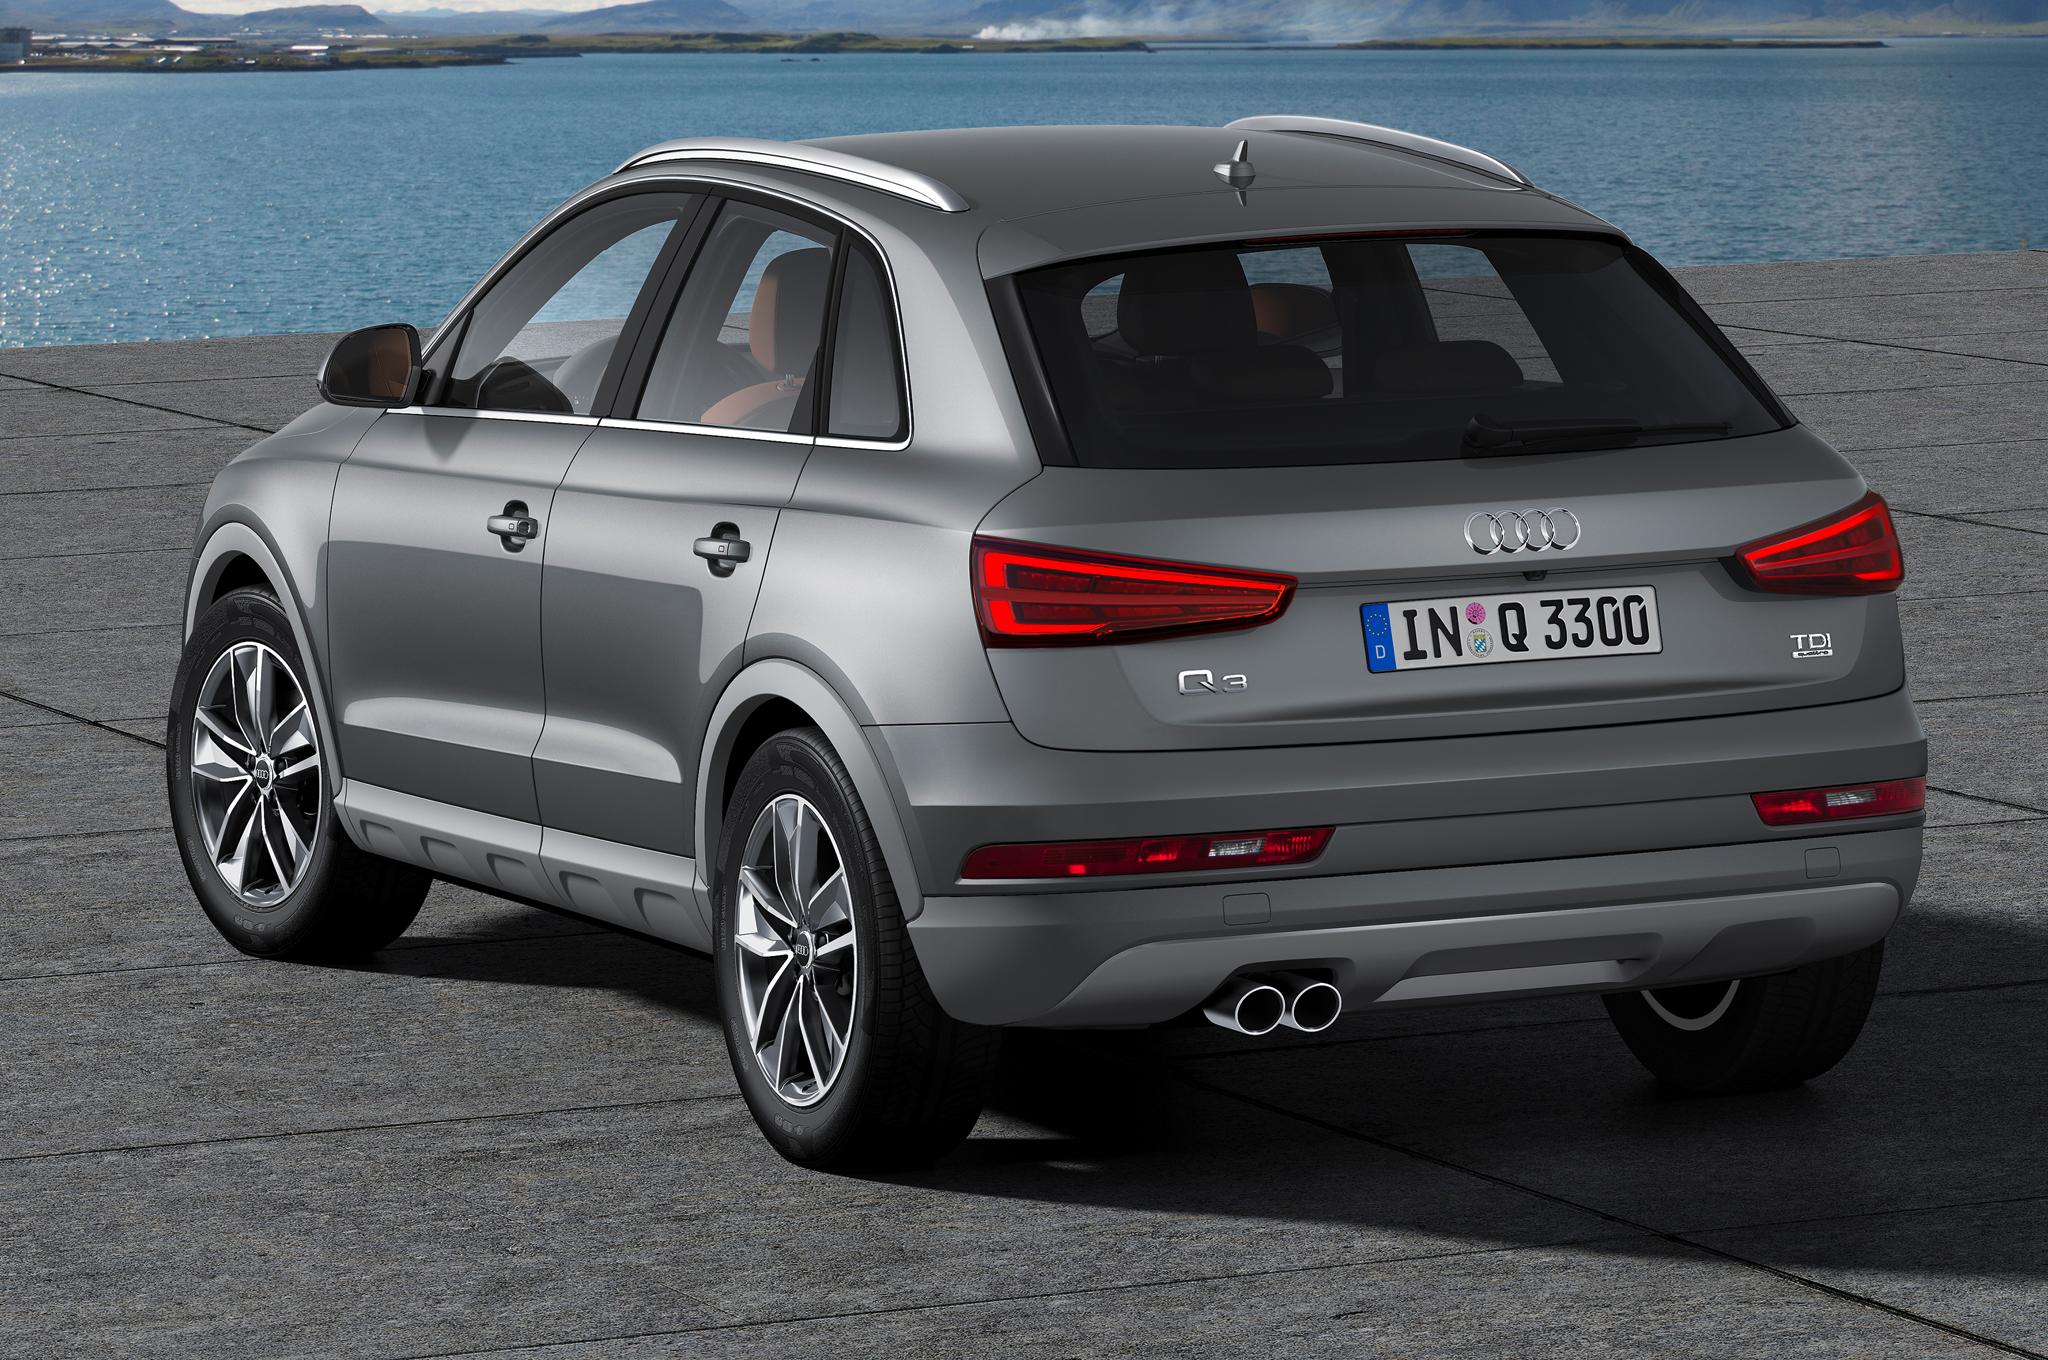 Kekurangan Audi Q3 2016 Tangguh